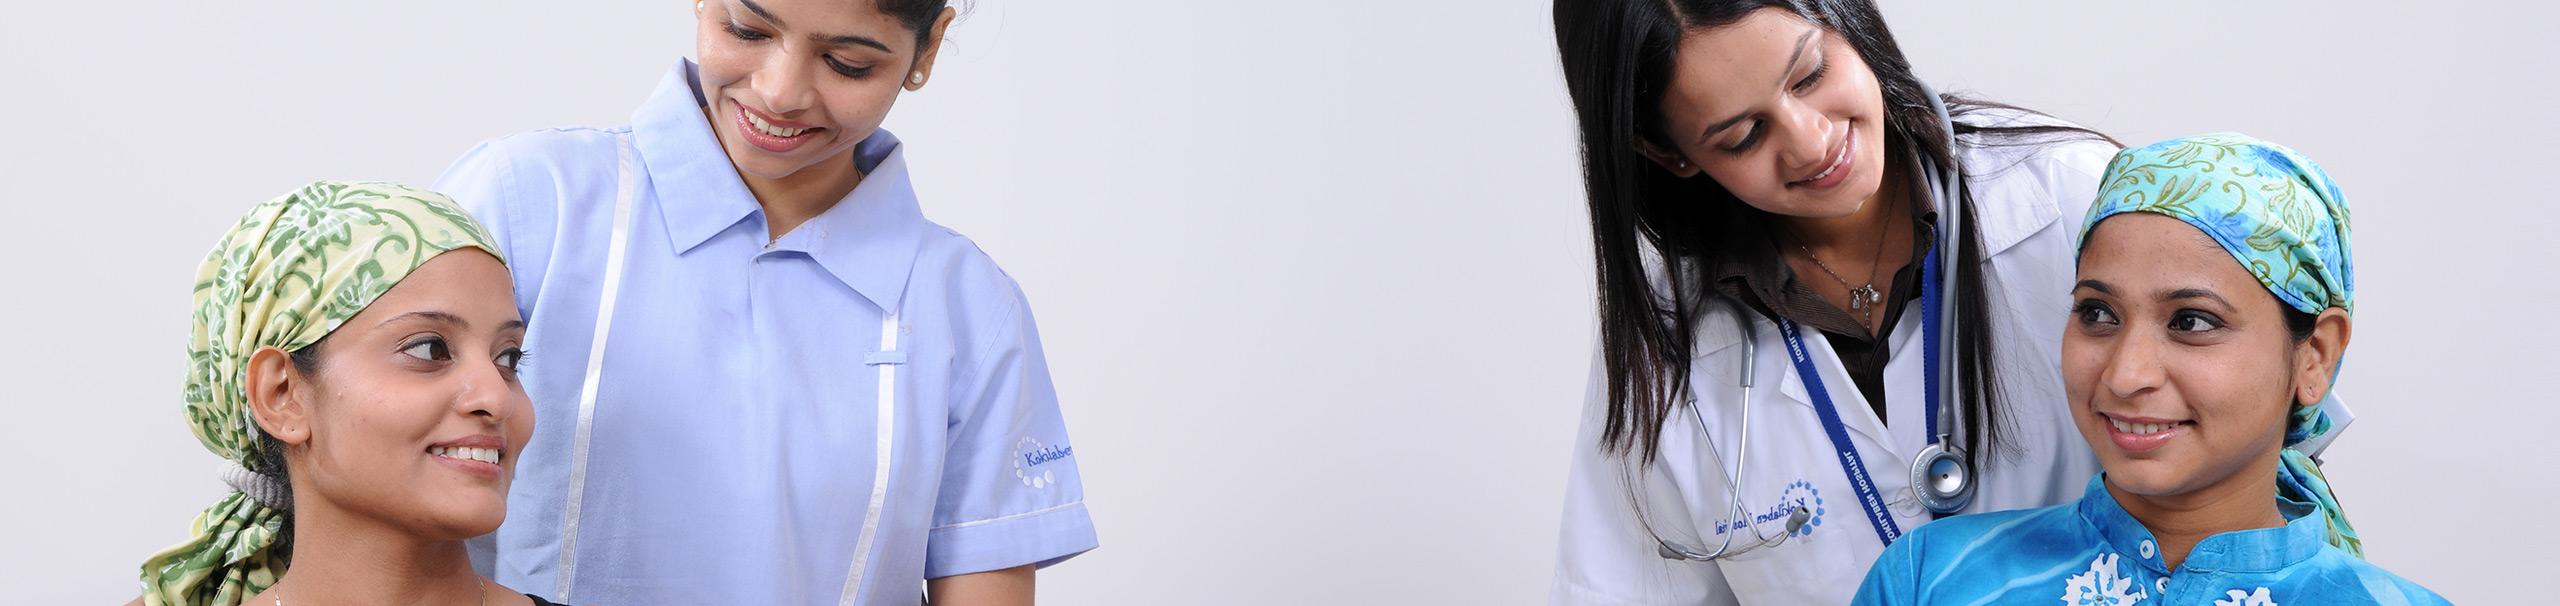 Best Lymphoma Treatment Hospital in India – Kokilaben Hospital